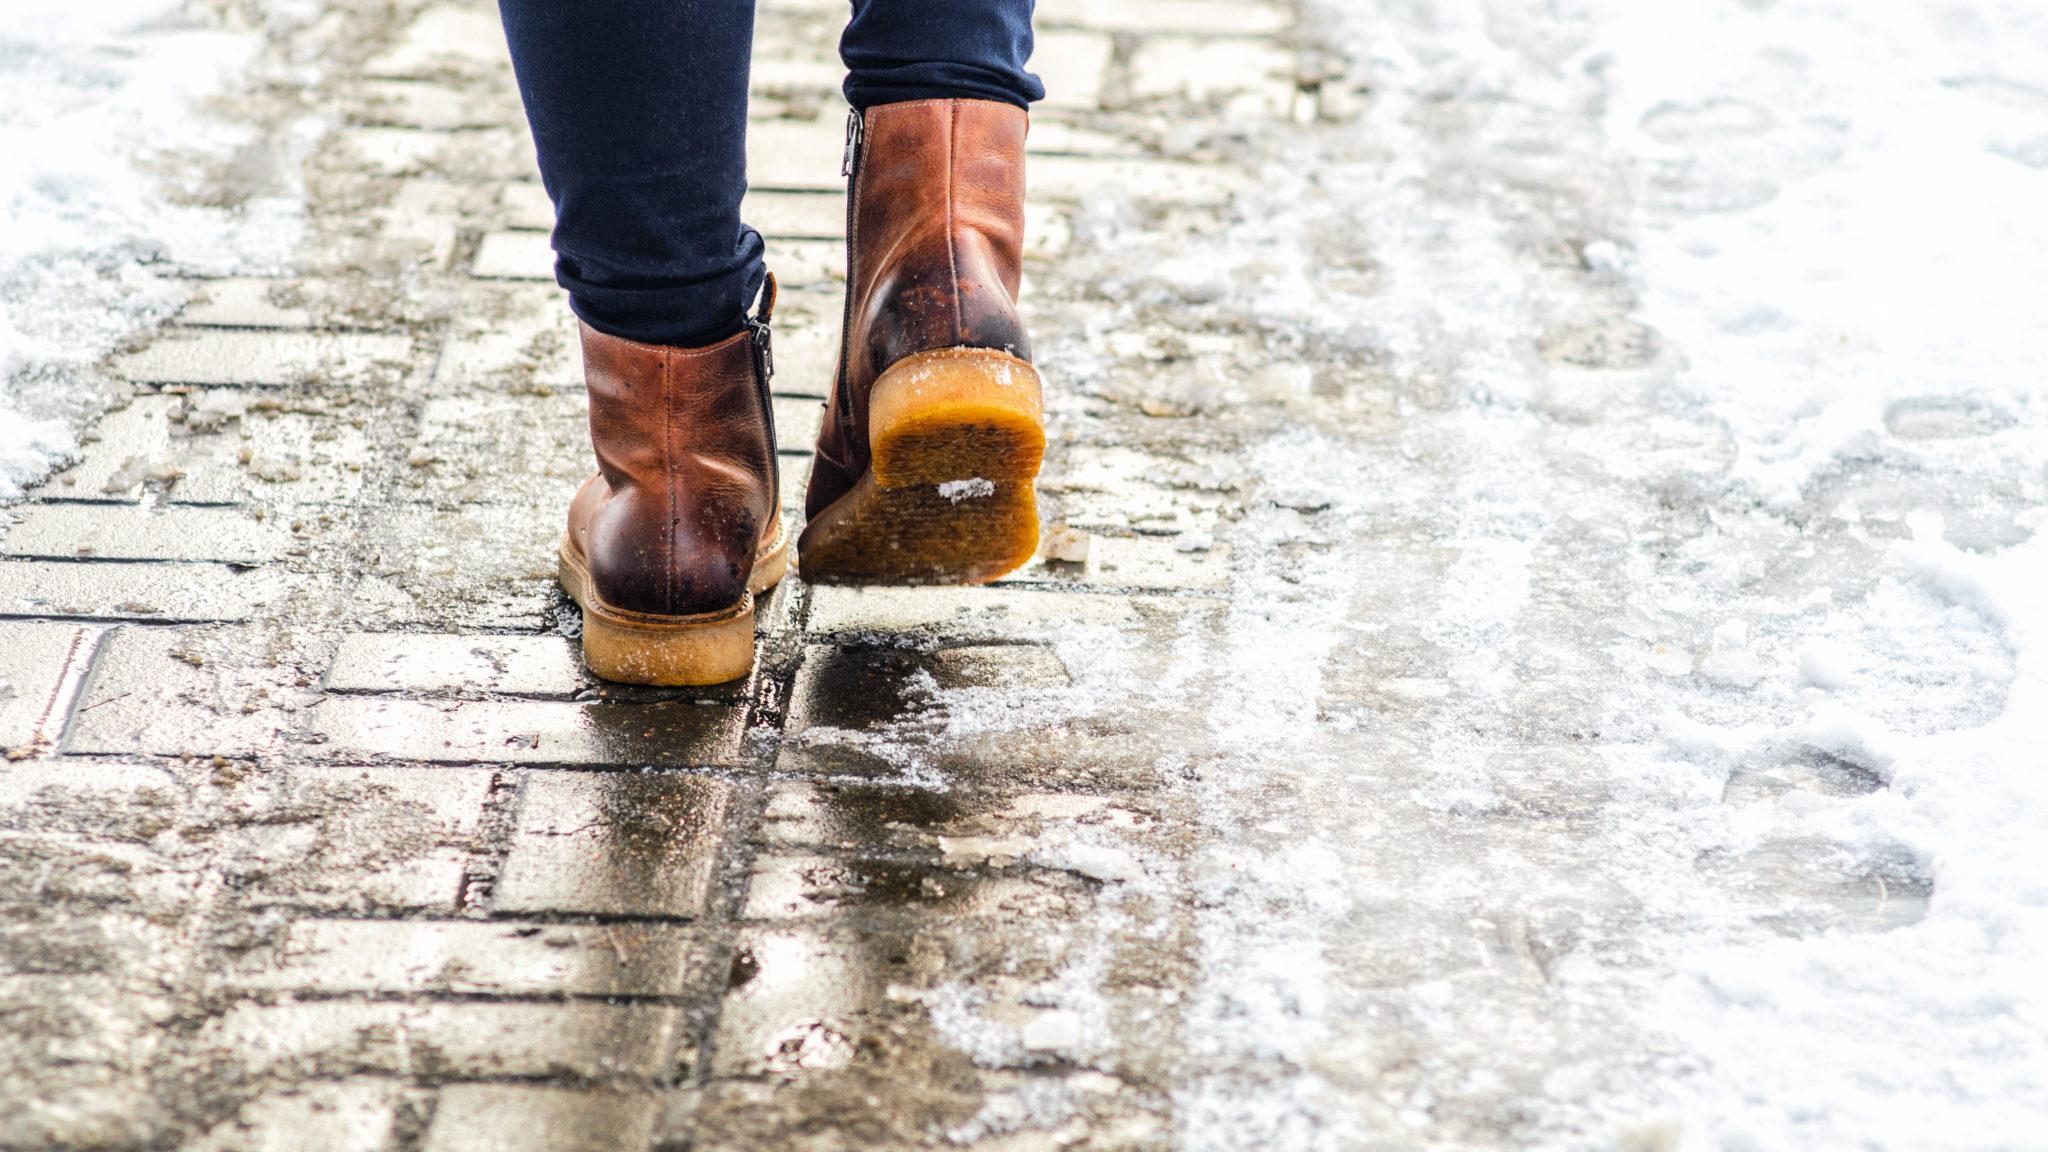 icy sidewalks, winter hazzard